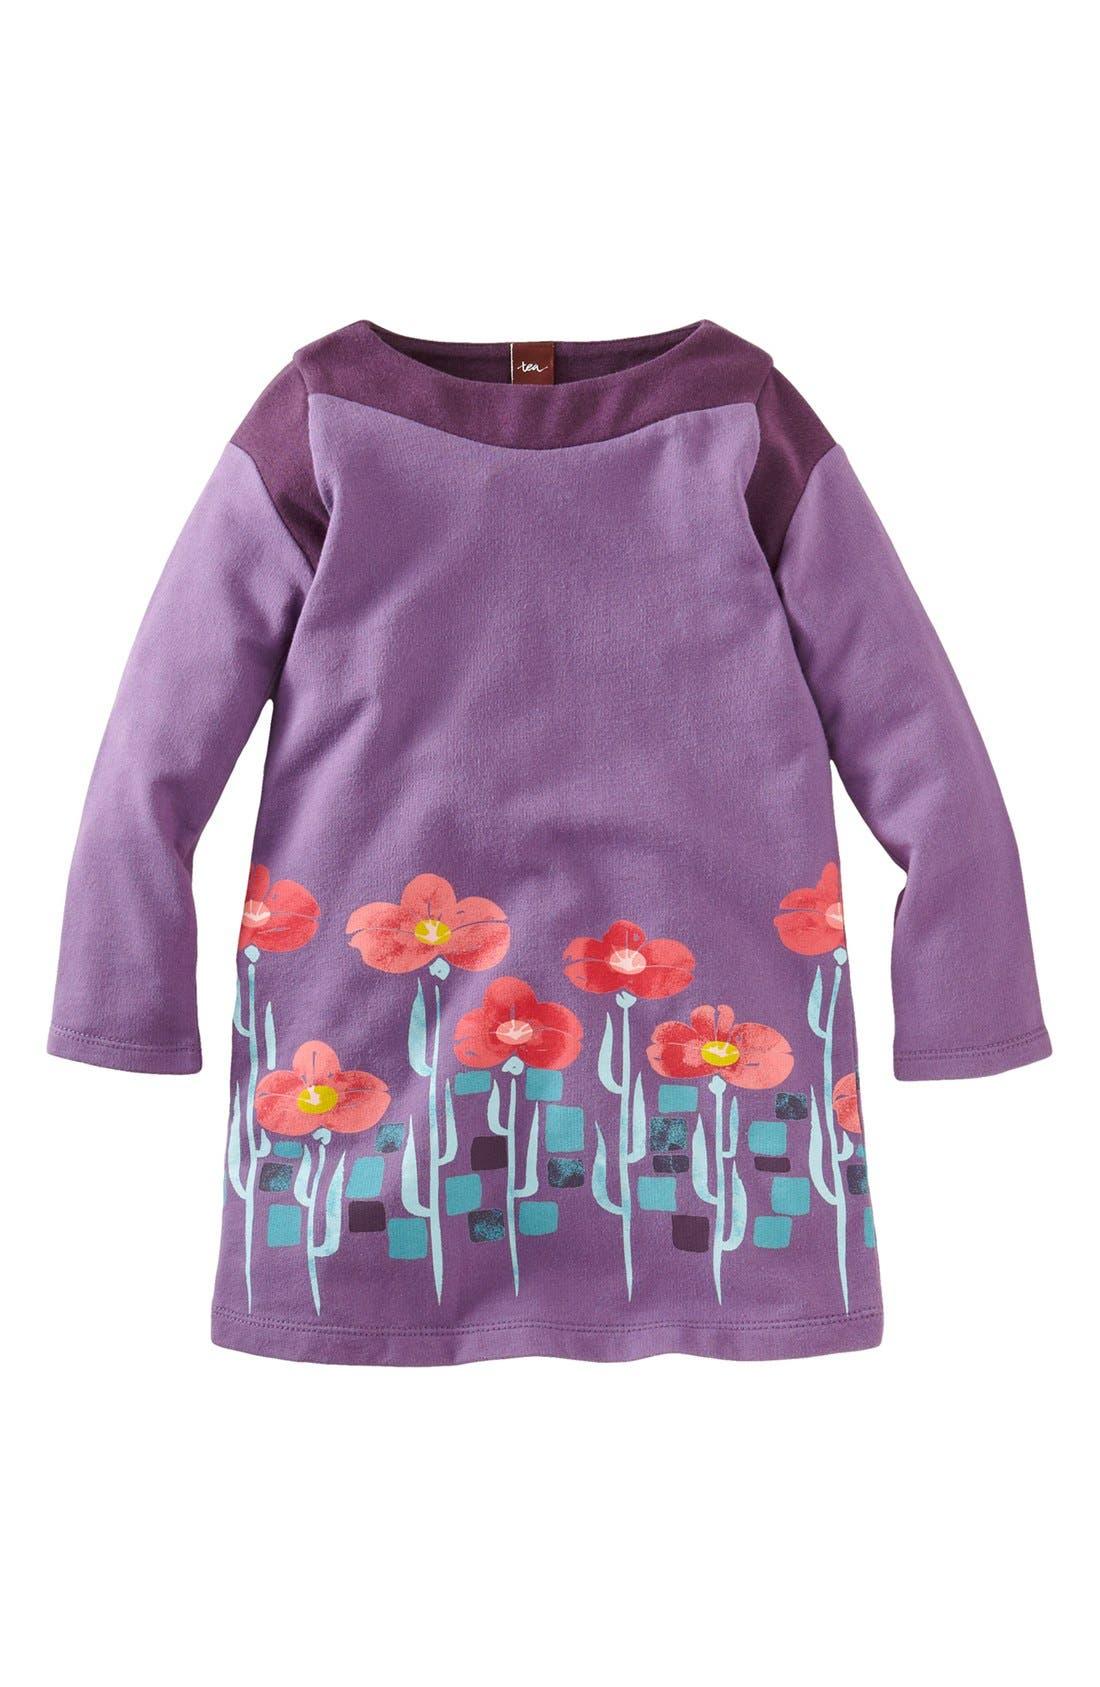 Alternate Image 1 Selected - Tea Collection 'Botanical Gardens' Dress (Little Girls & Big Girls)